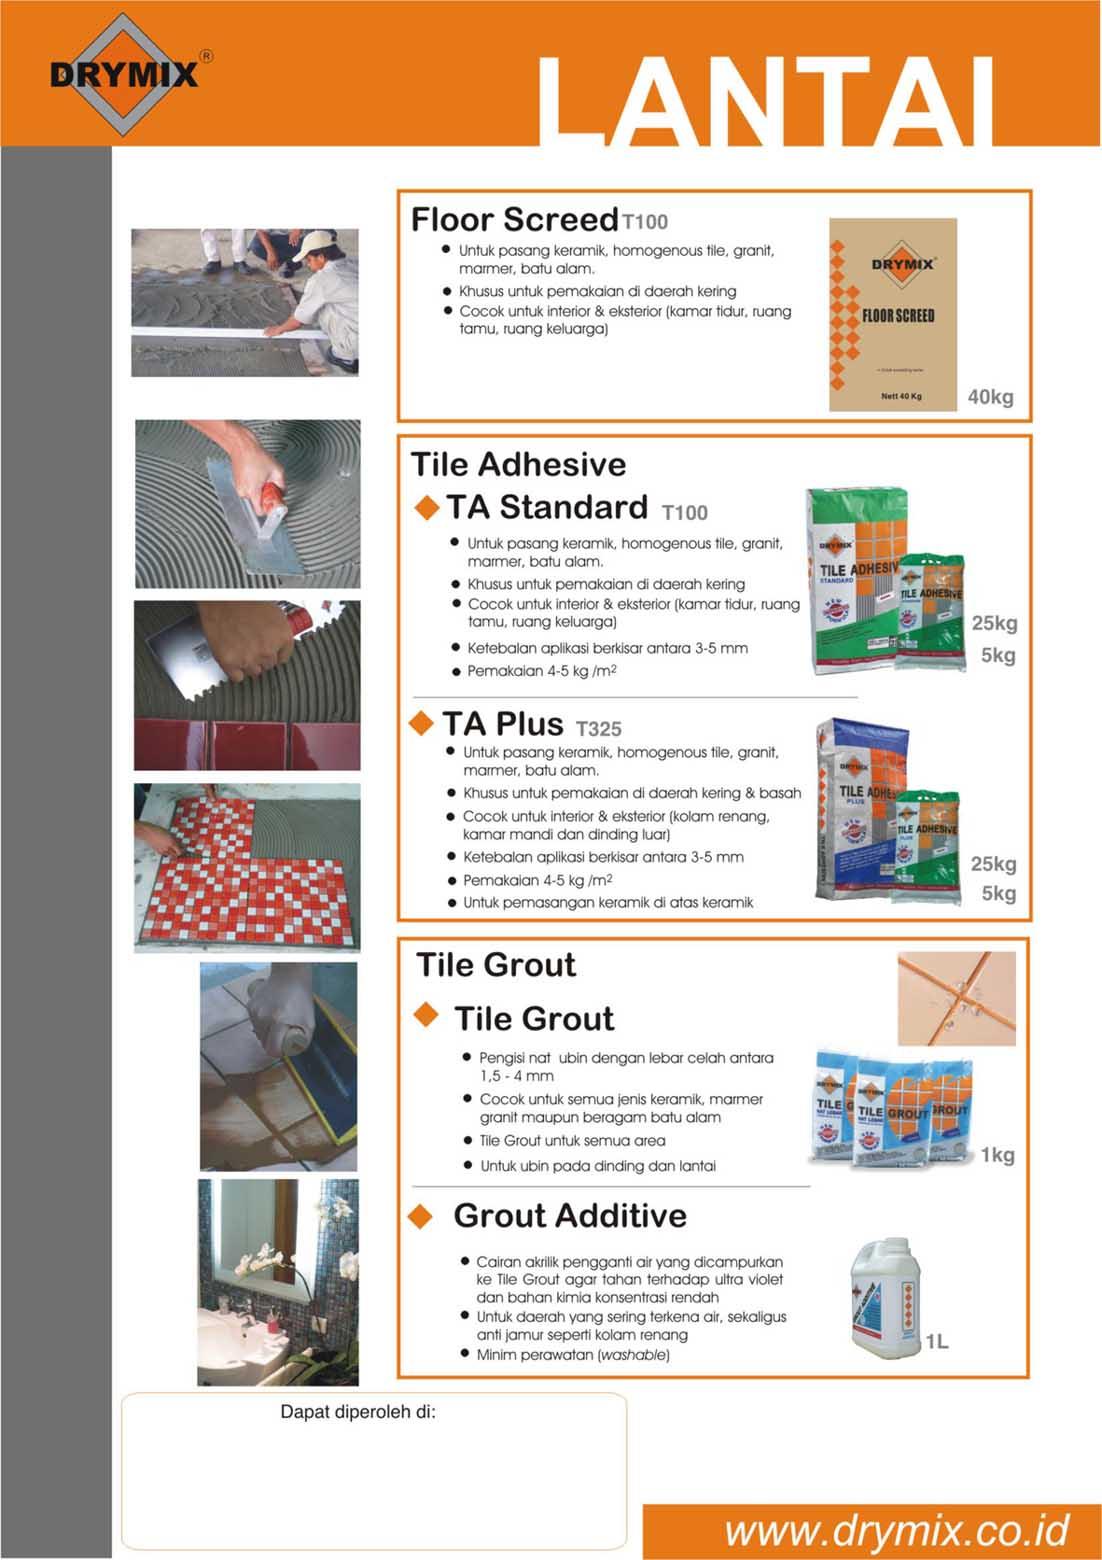 Mortar Instan Drymix untuk Aplikasi Lantai